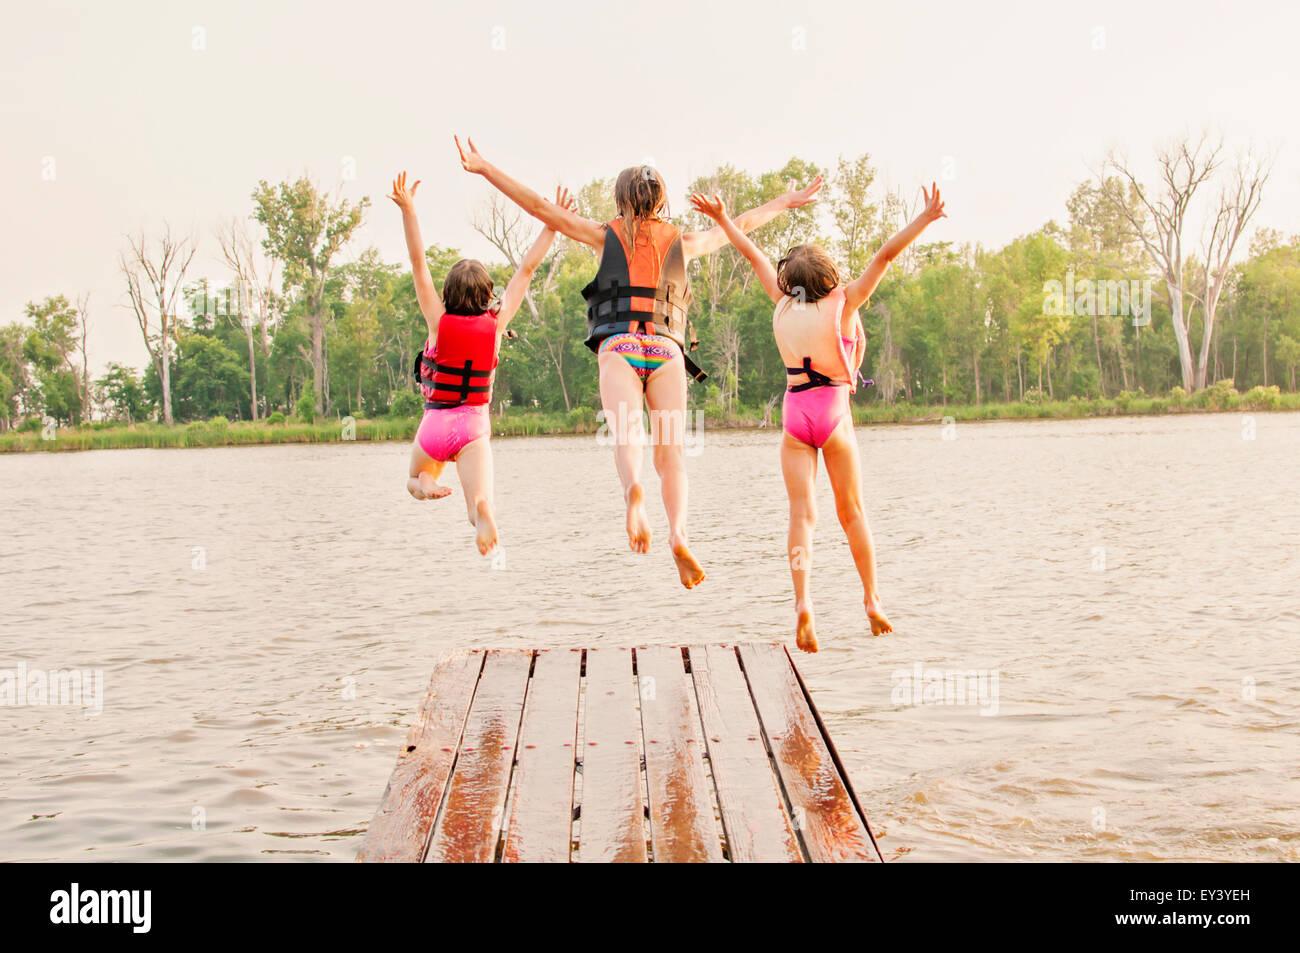 Three girls jump off dock into lake - Stock Image